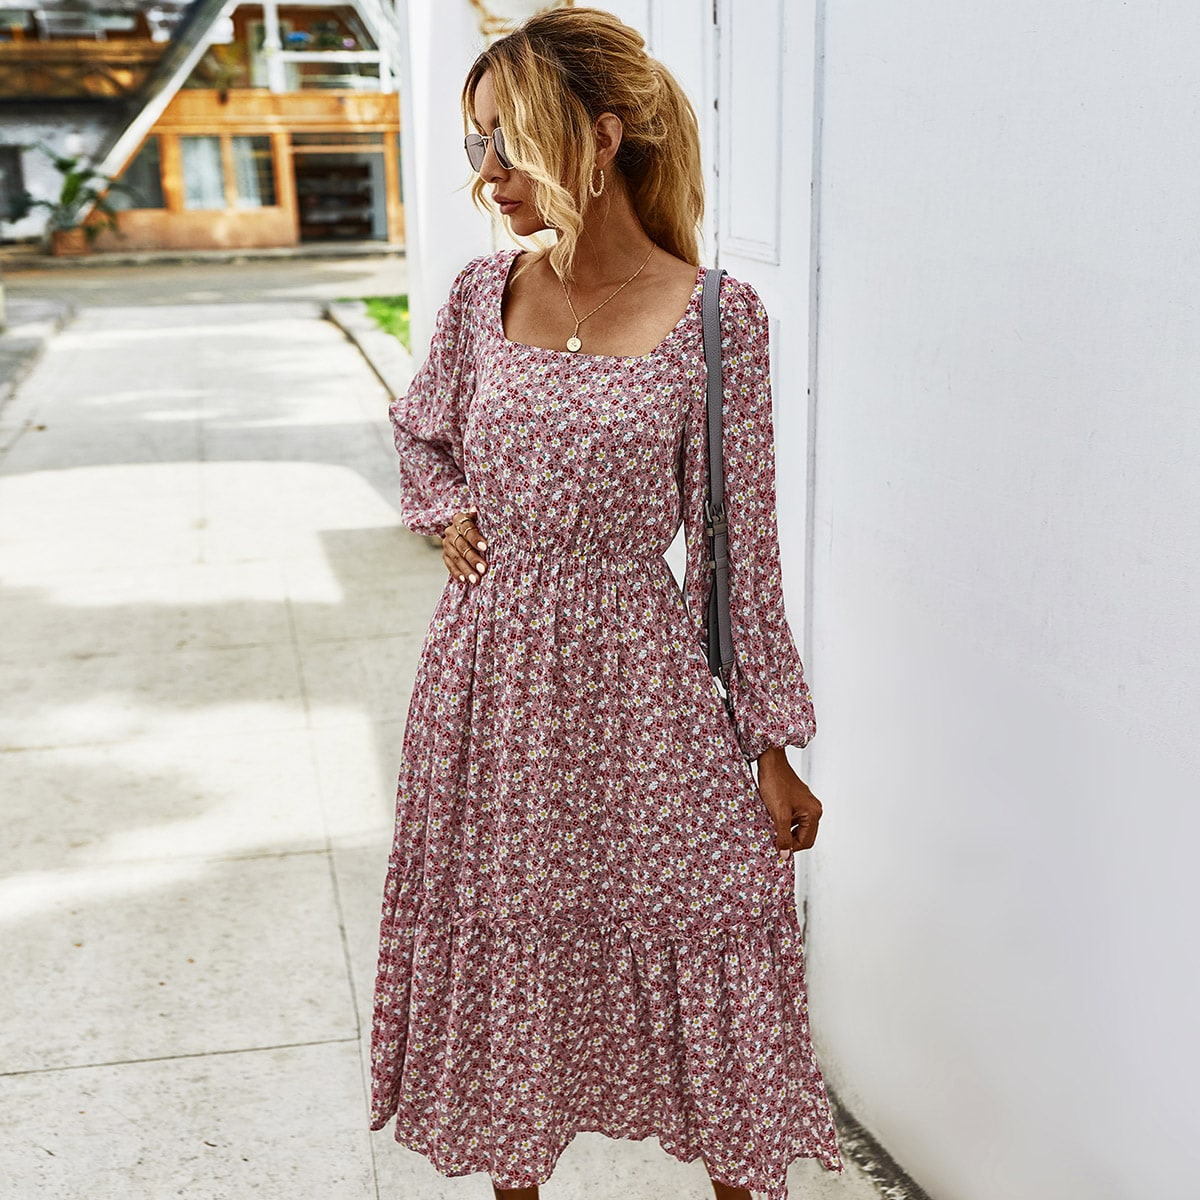 SHEIN / Ditsy Floral Square Neck Ruffle Hem A-line Dress